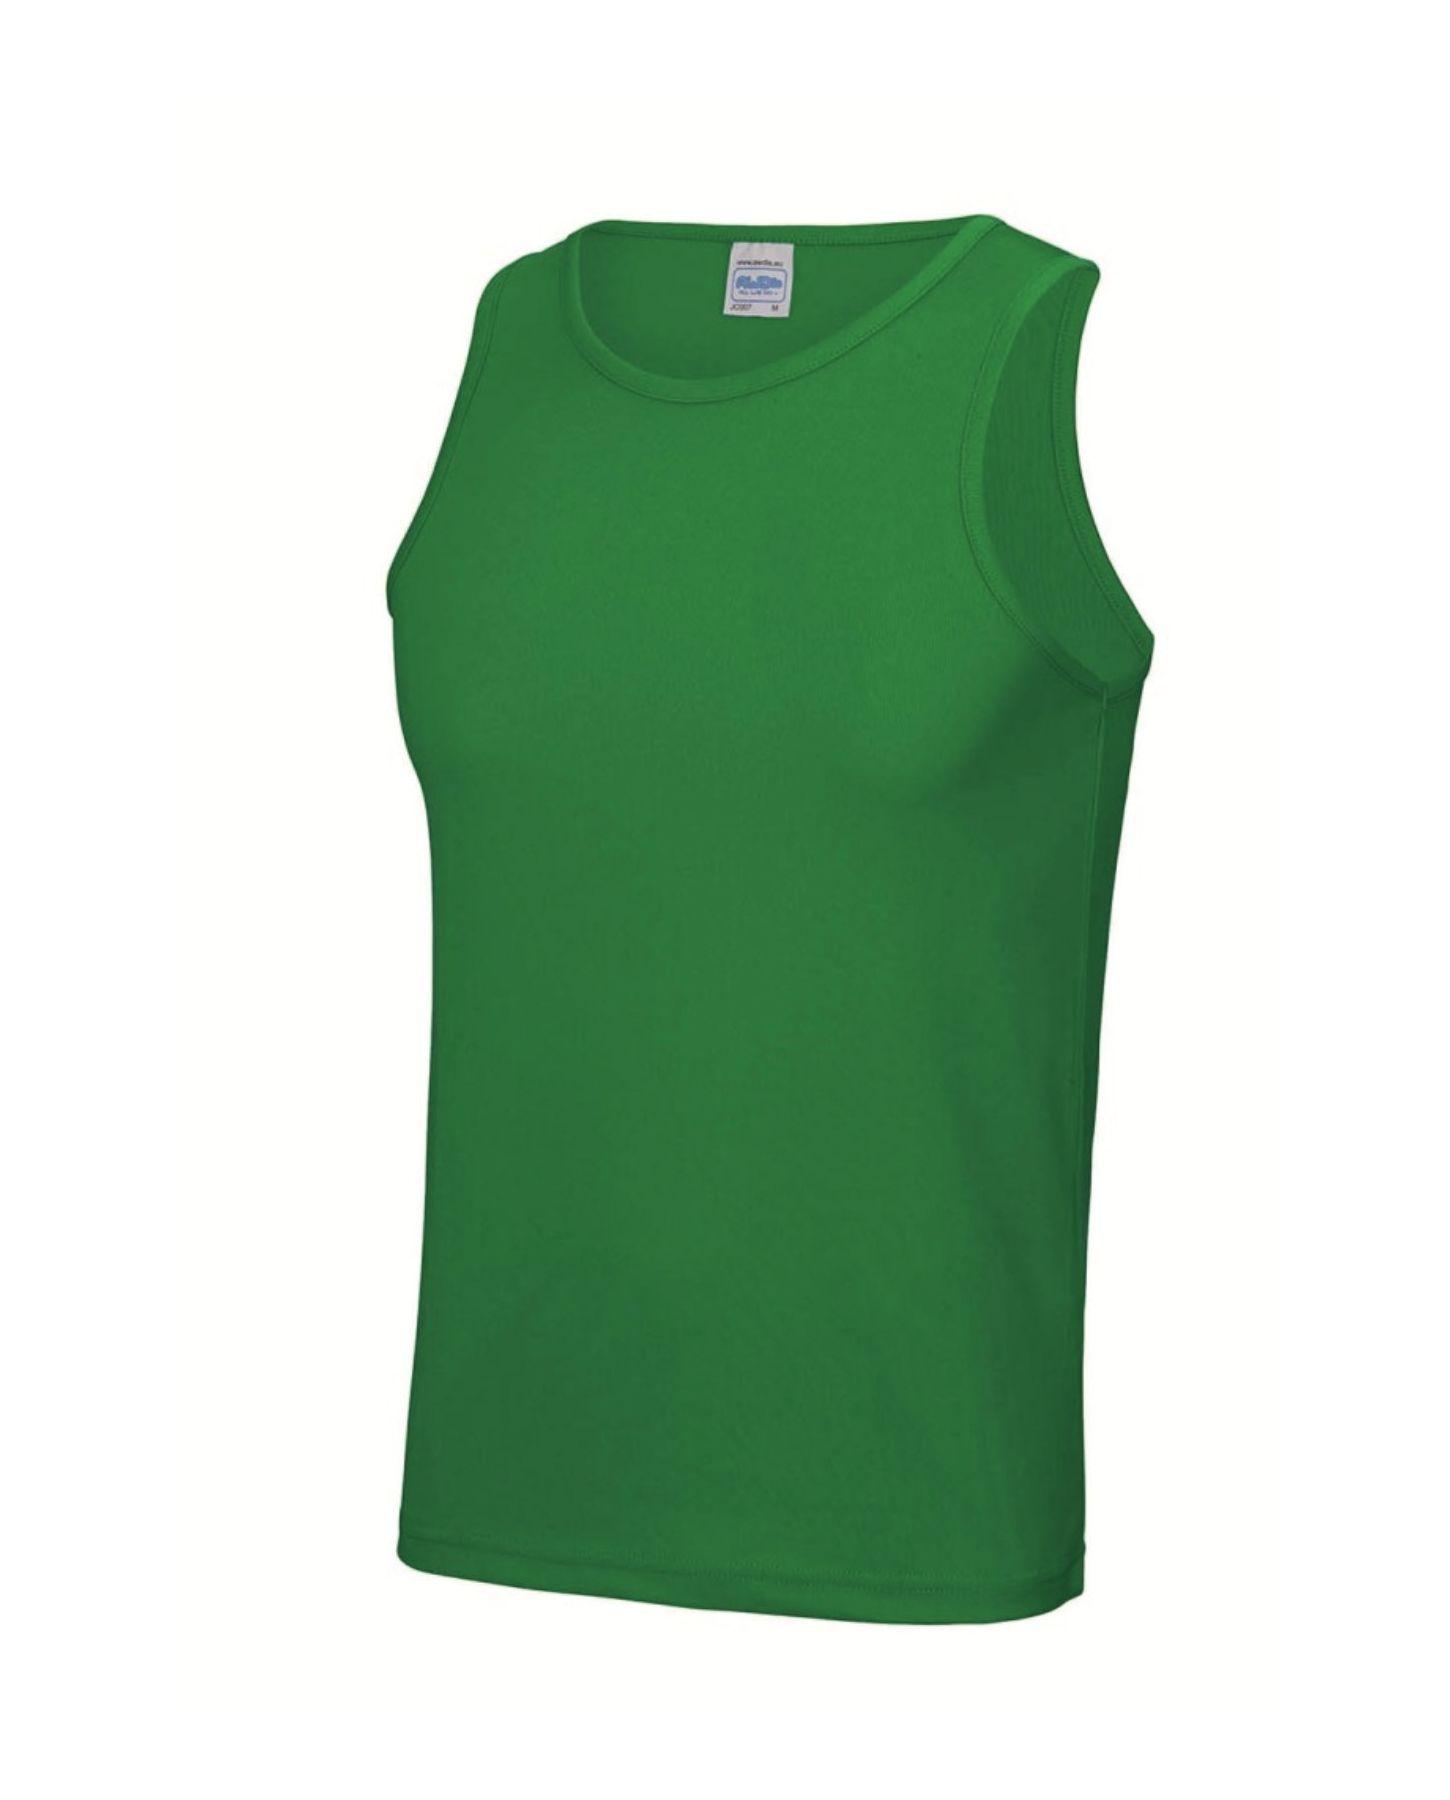 Littleport Runners – Ladyfit Vest